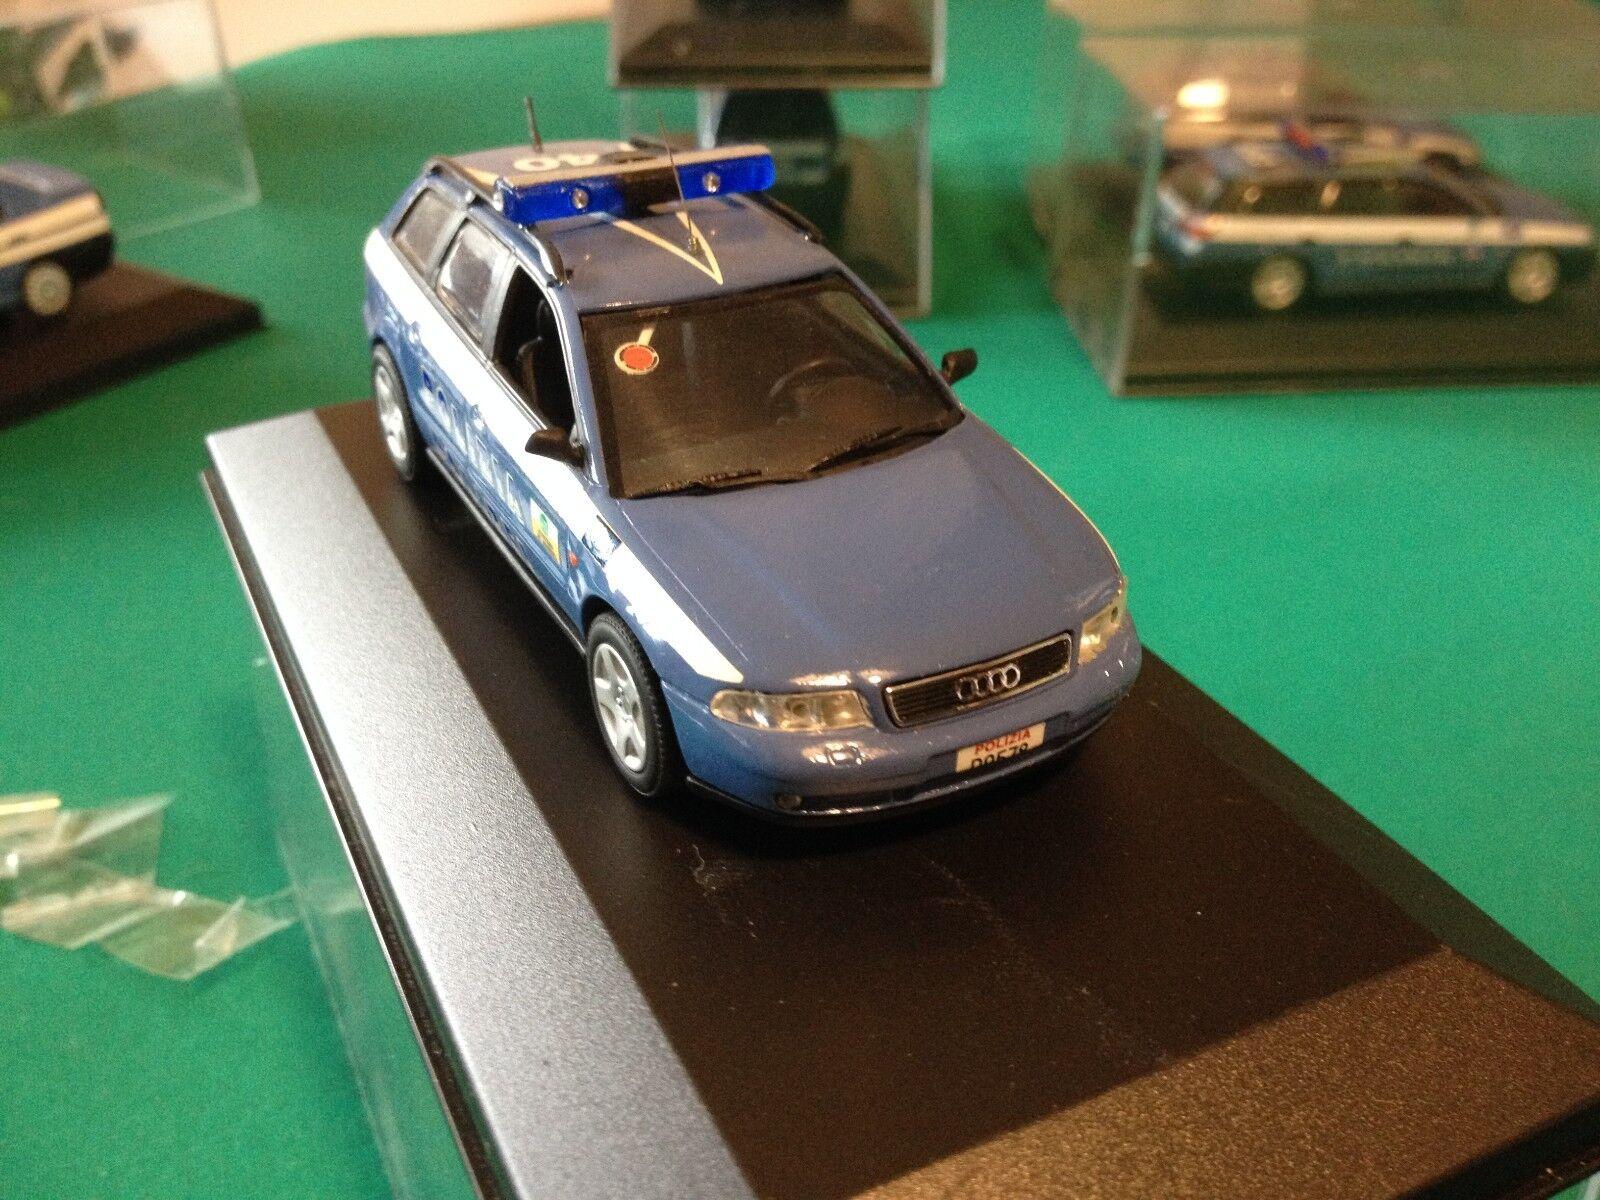 AUDI A4 AVANT I SERIE  POLIZIA AUTOSTRADALE BILINGUE  -POLICE   IN SCALA 1/43